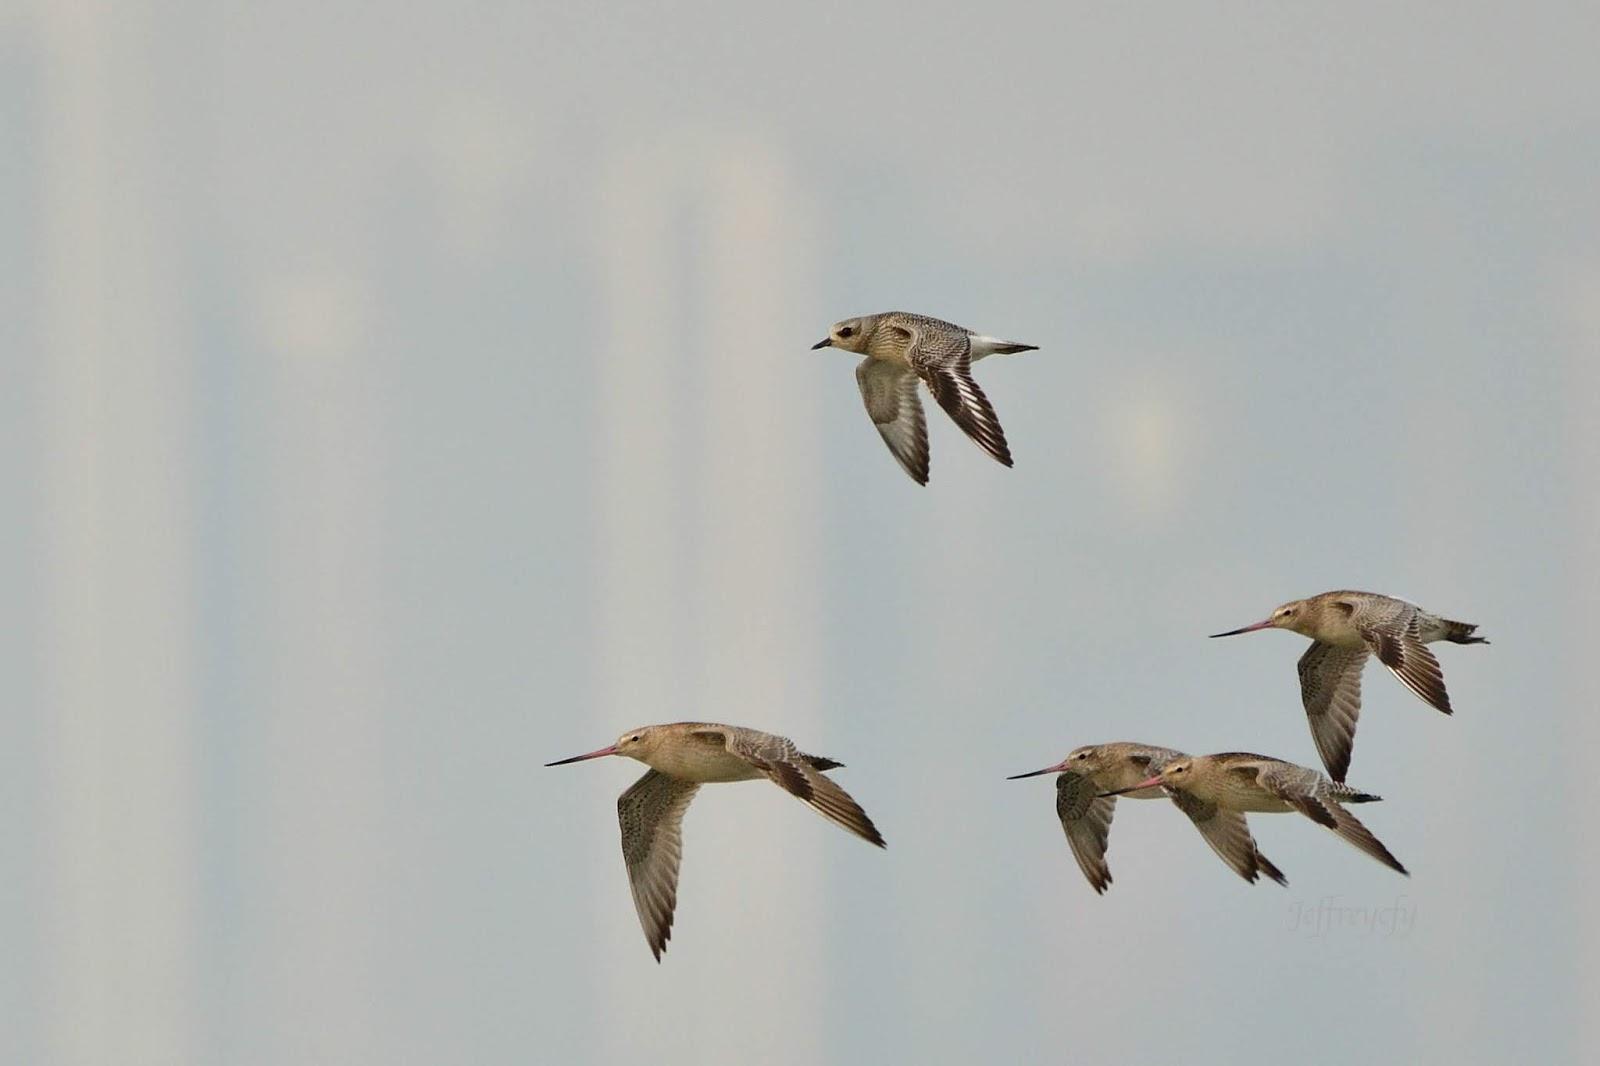 我的生態攝影集: 斑尾塍鷸, 斑尾鷸, Bar-tailed Godwit, Limosa lapponica,